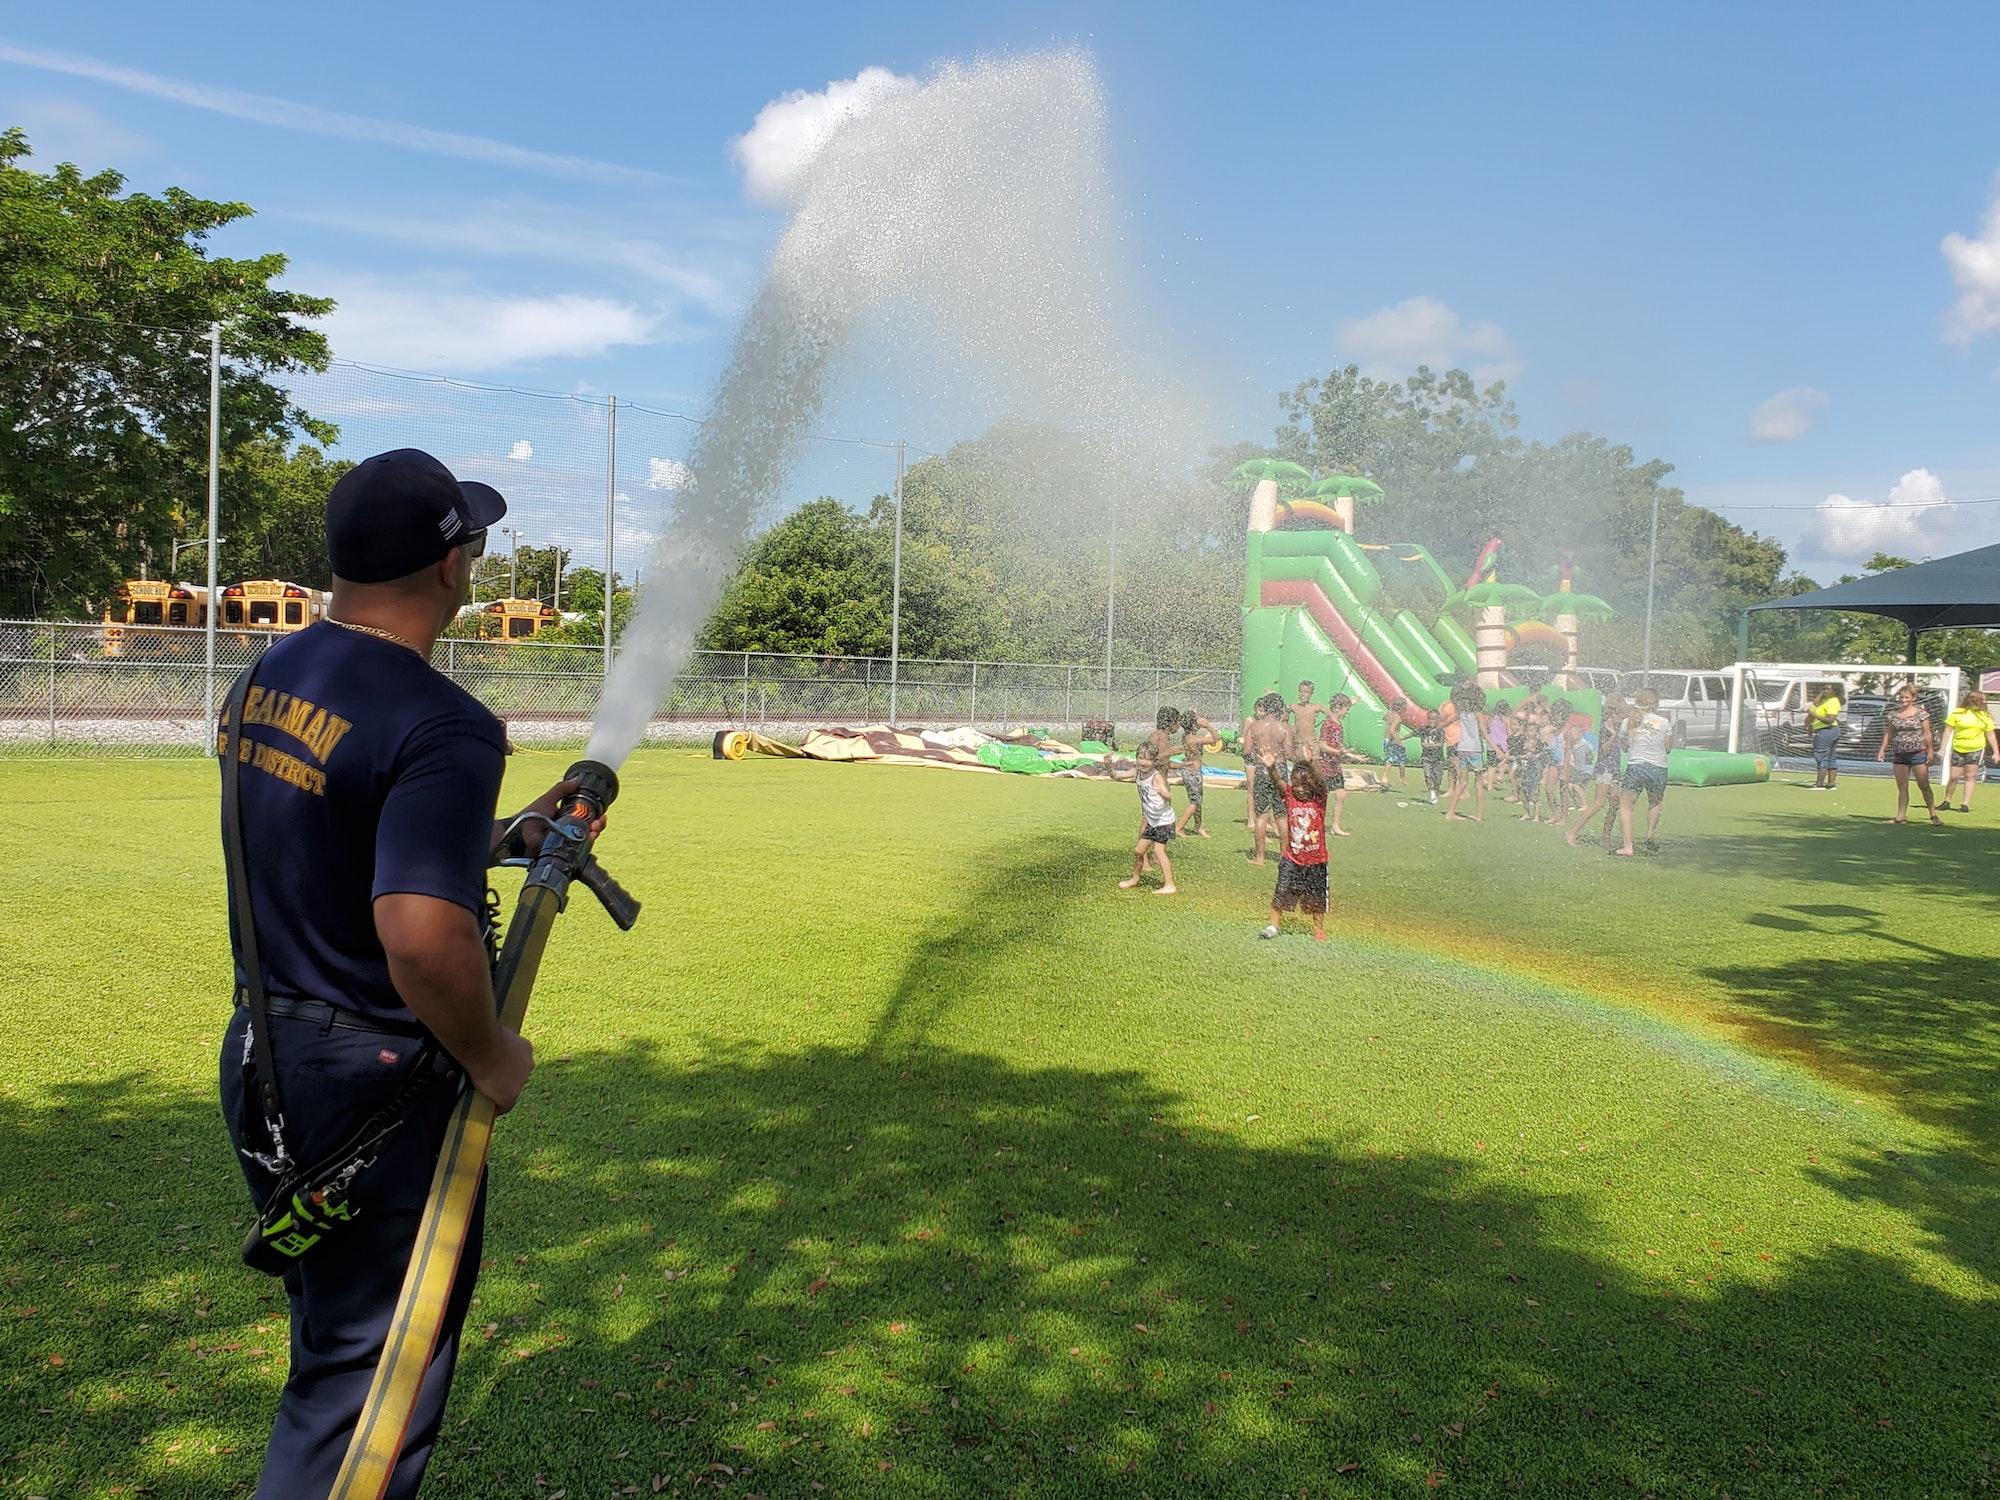 Firefighter spraying water on children